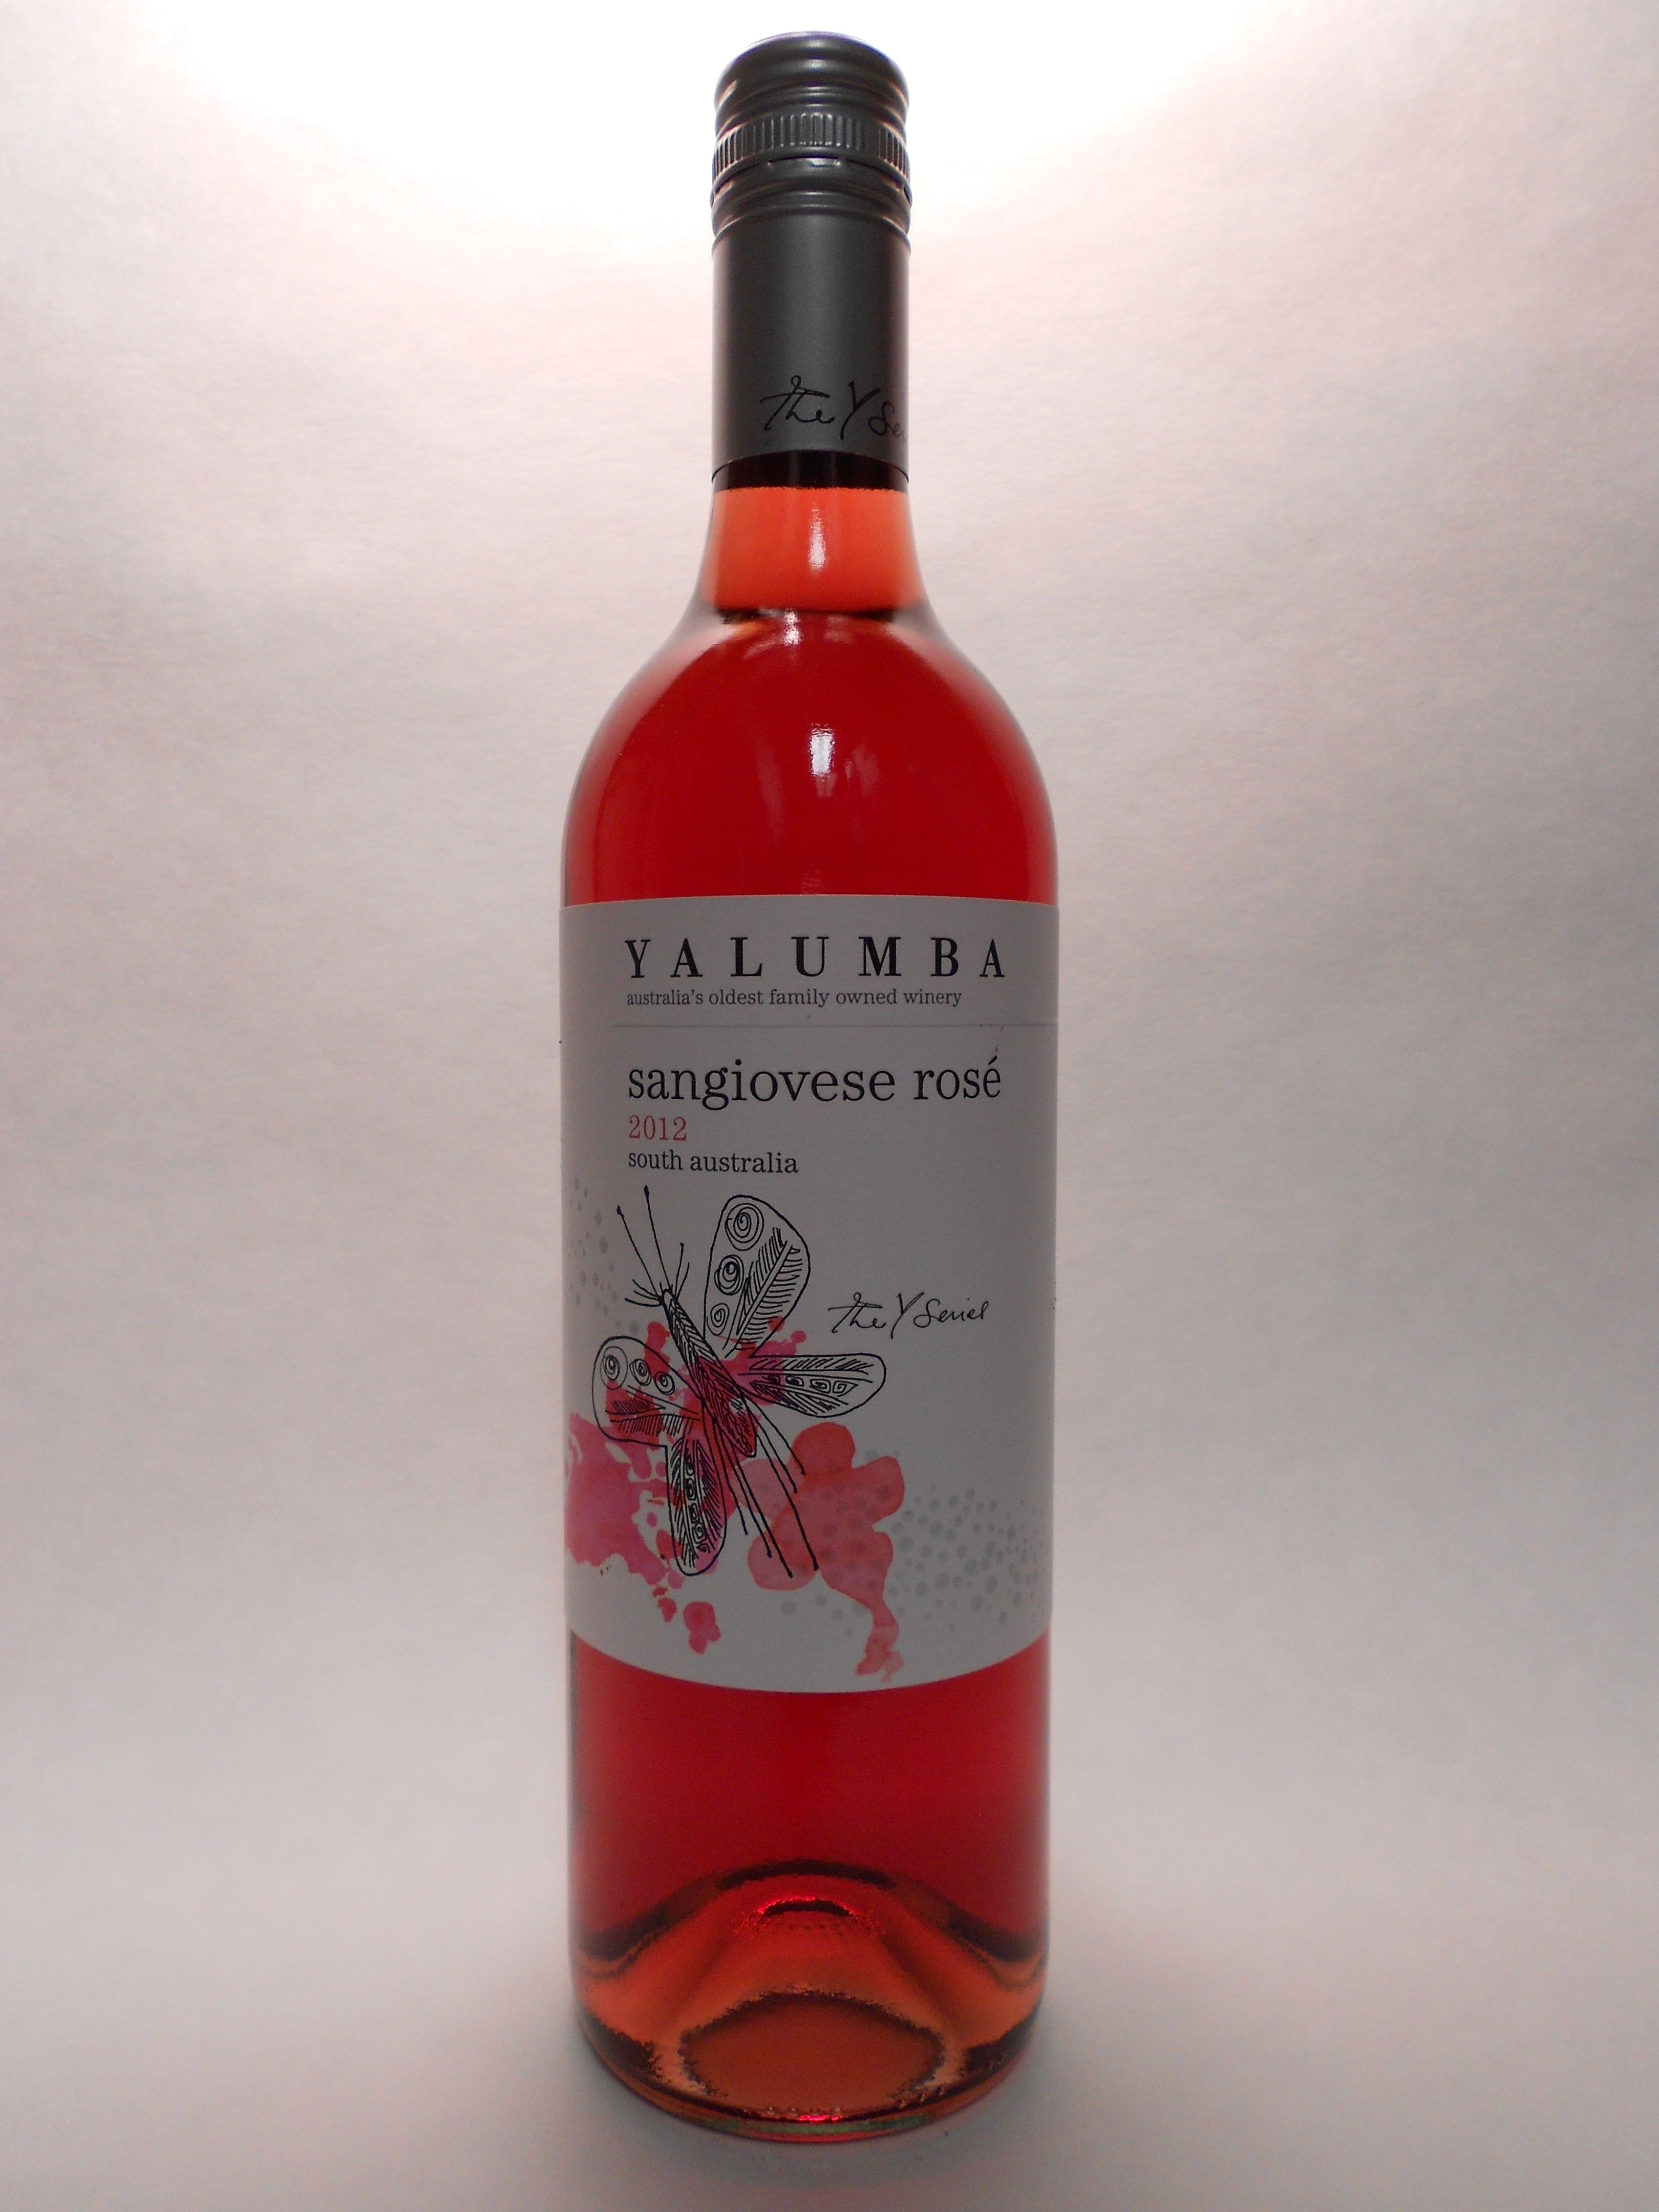 2012 Yalumba Sangiovese South Australia Rose Y Series Sku 61390 Www Bassins Com Phone 202 338 1433 Rose Wine Wine Bottle Different Wines